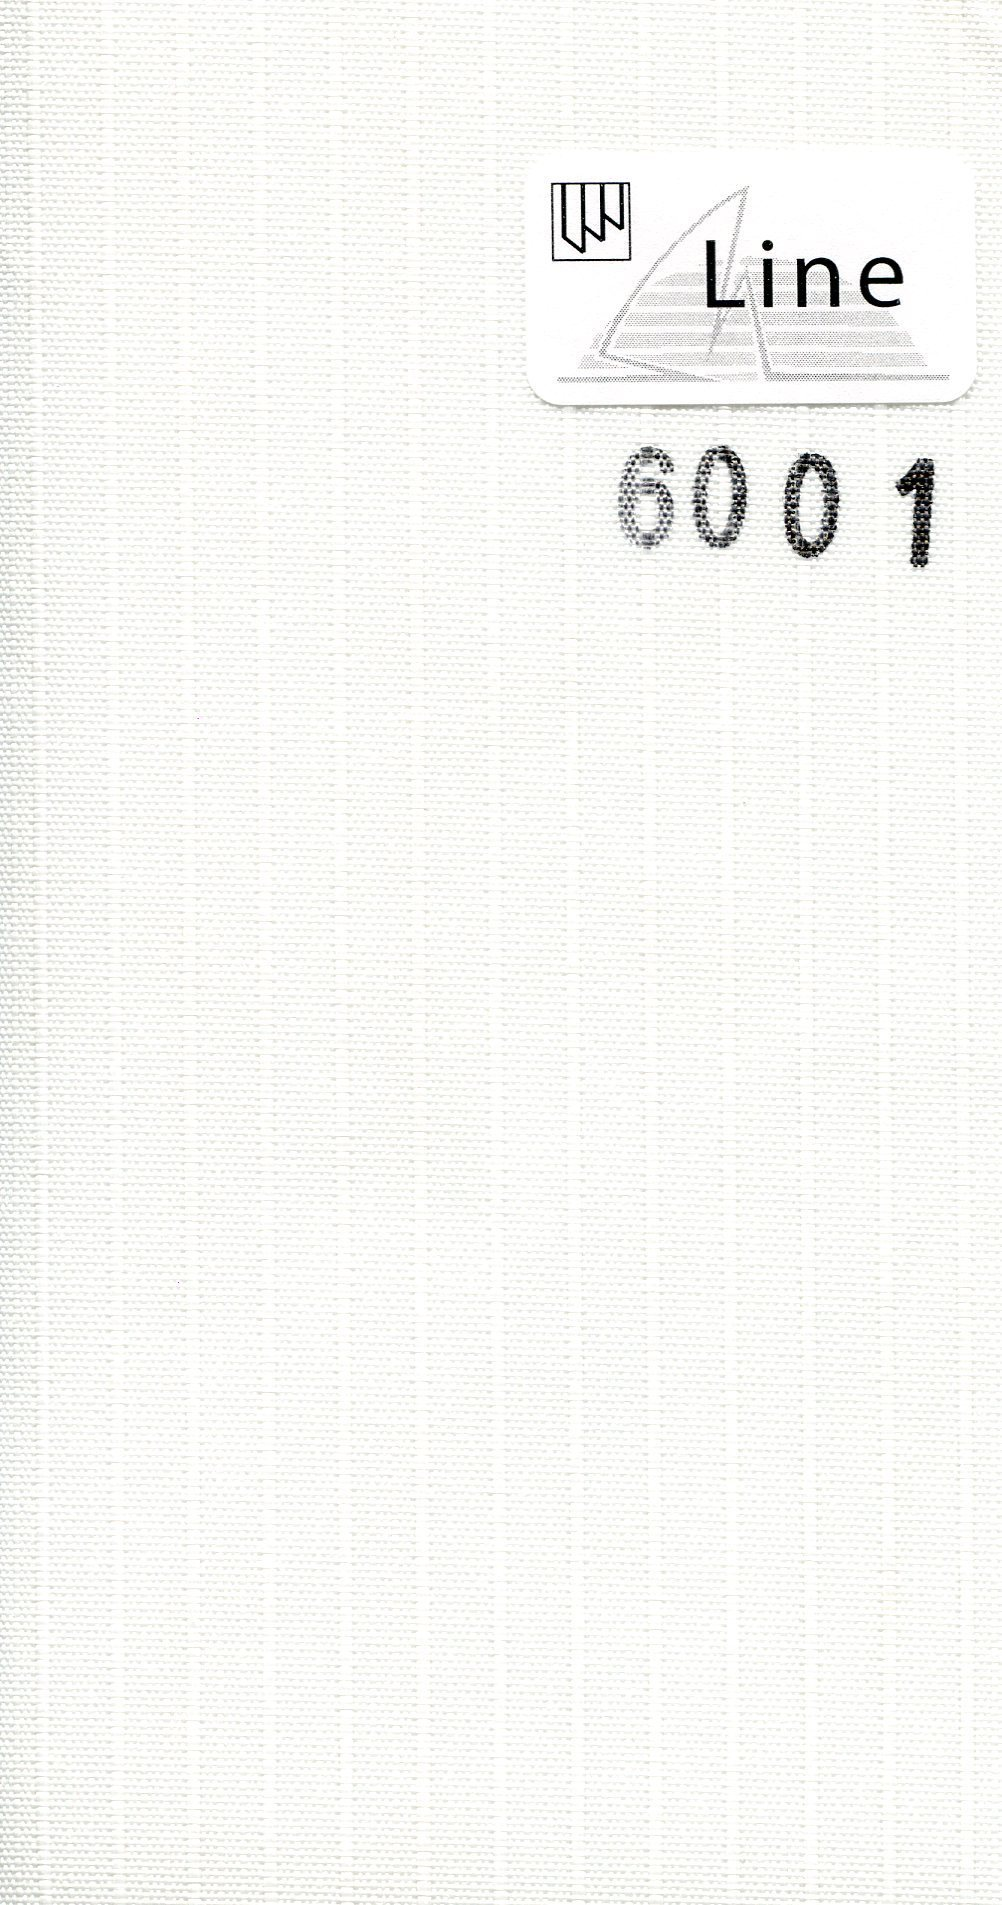 2 Line 6001